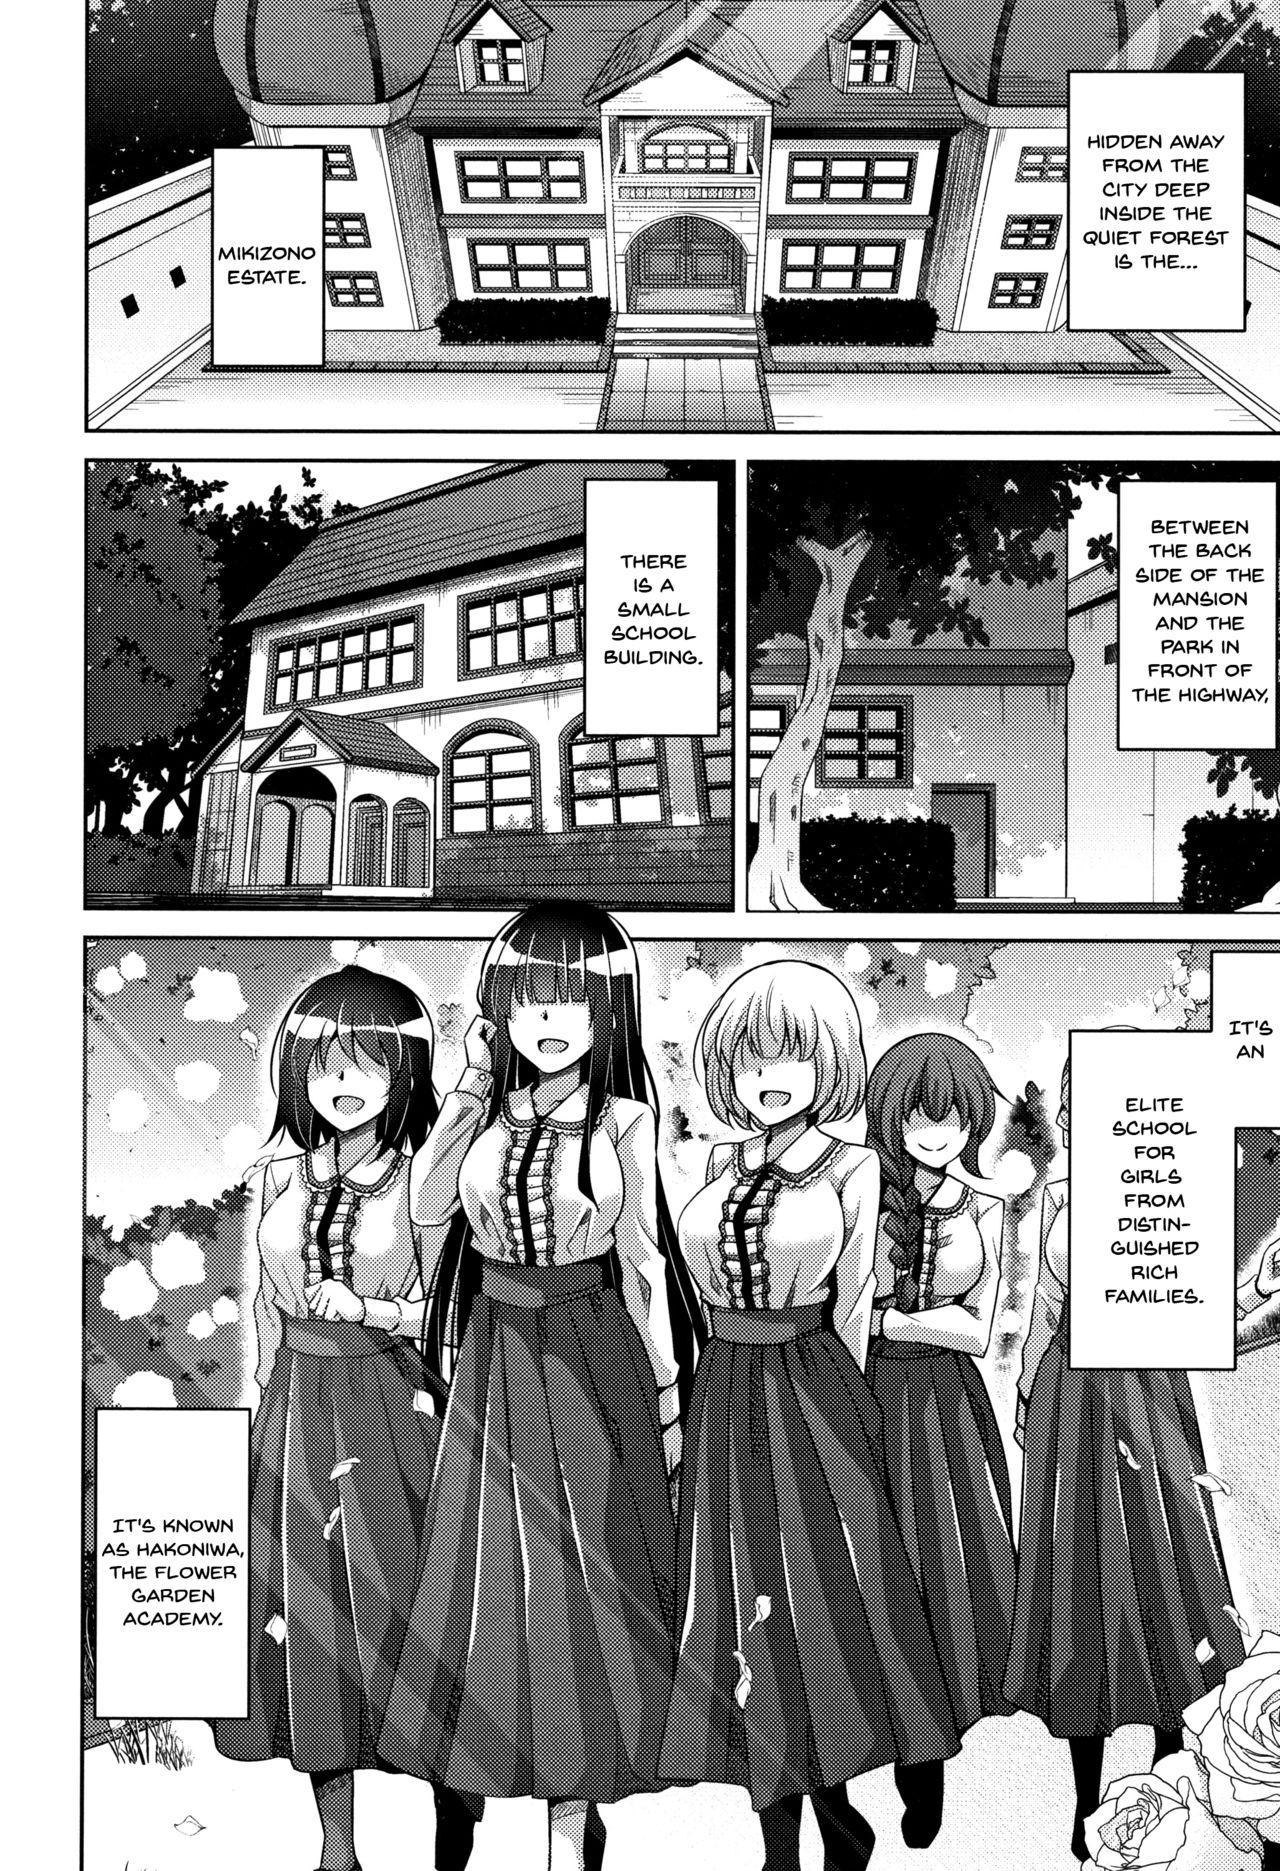 [Nikusoukyuu.] Hakoniwa ni Saku Mesu no Hana   women like flowers growing from the-garden Ch. 0-2 [English] {Doujins.com} 8